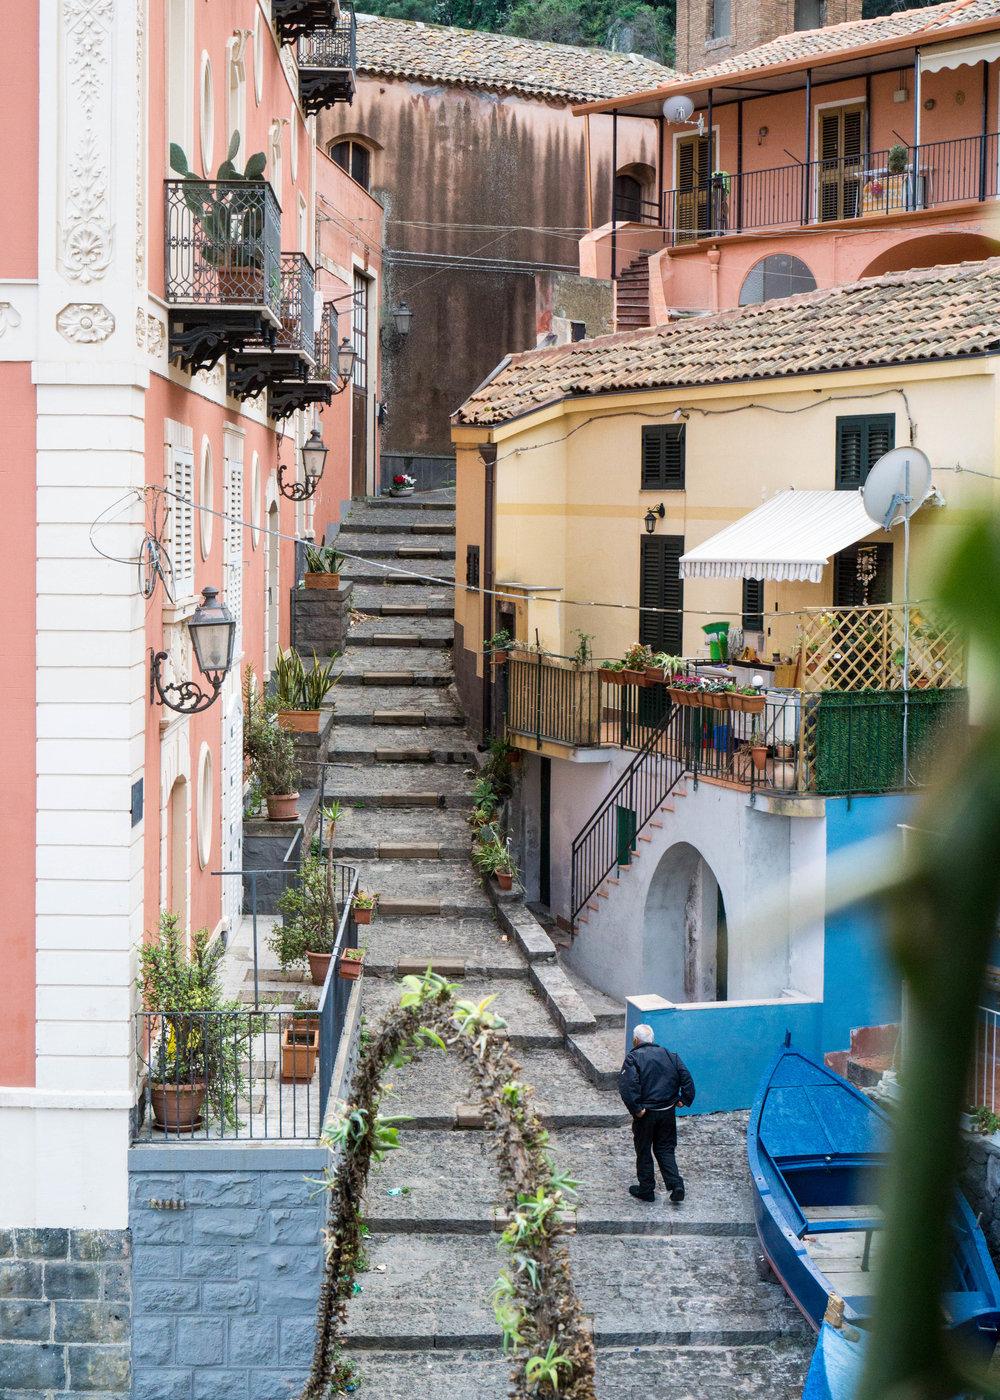 Acireale, Italy